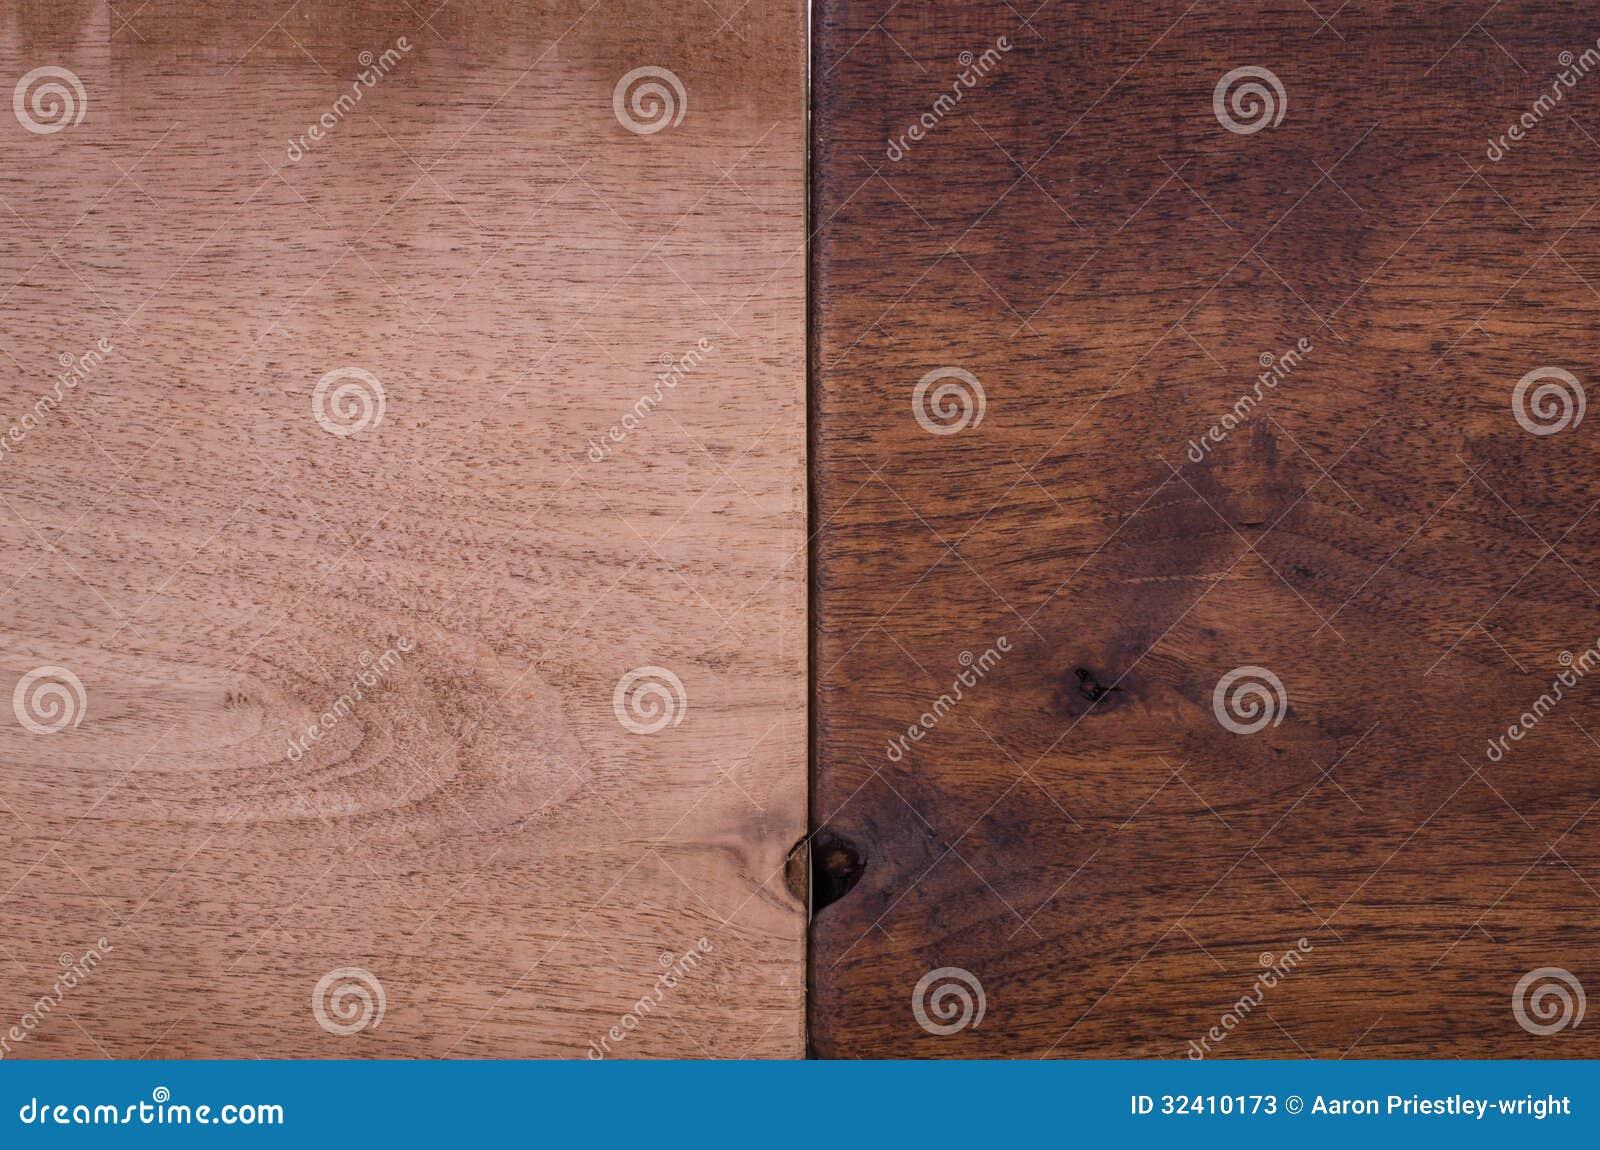 grain oil unfinished up walnut wax wood macro side rough cut less